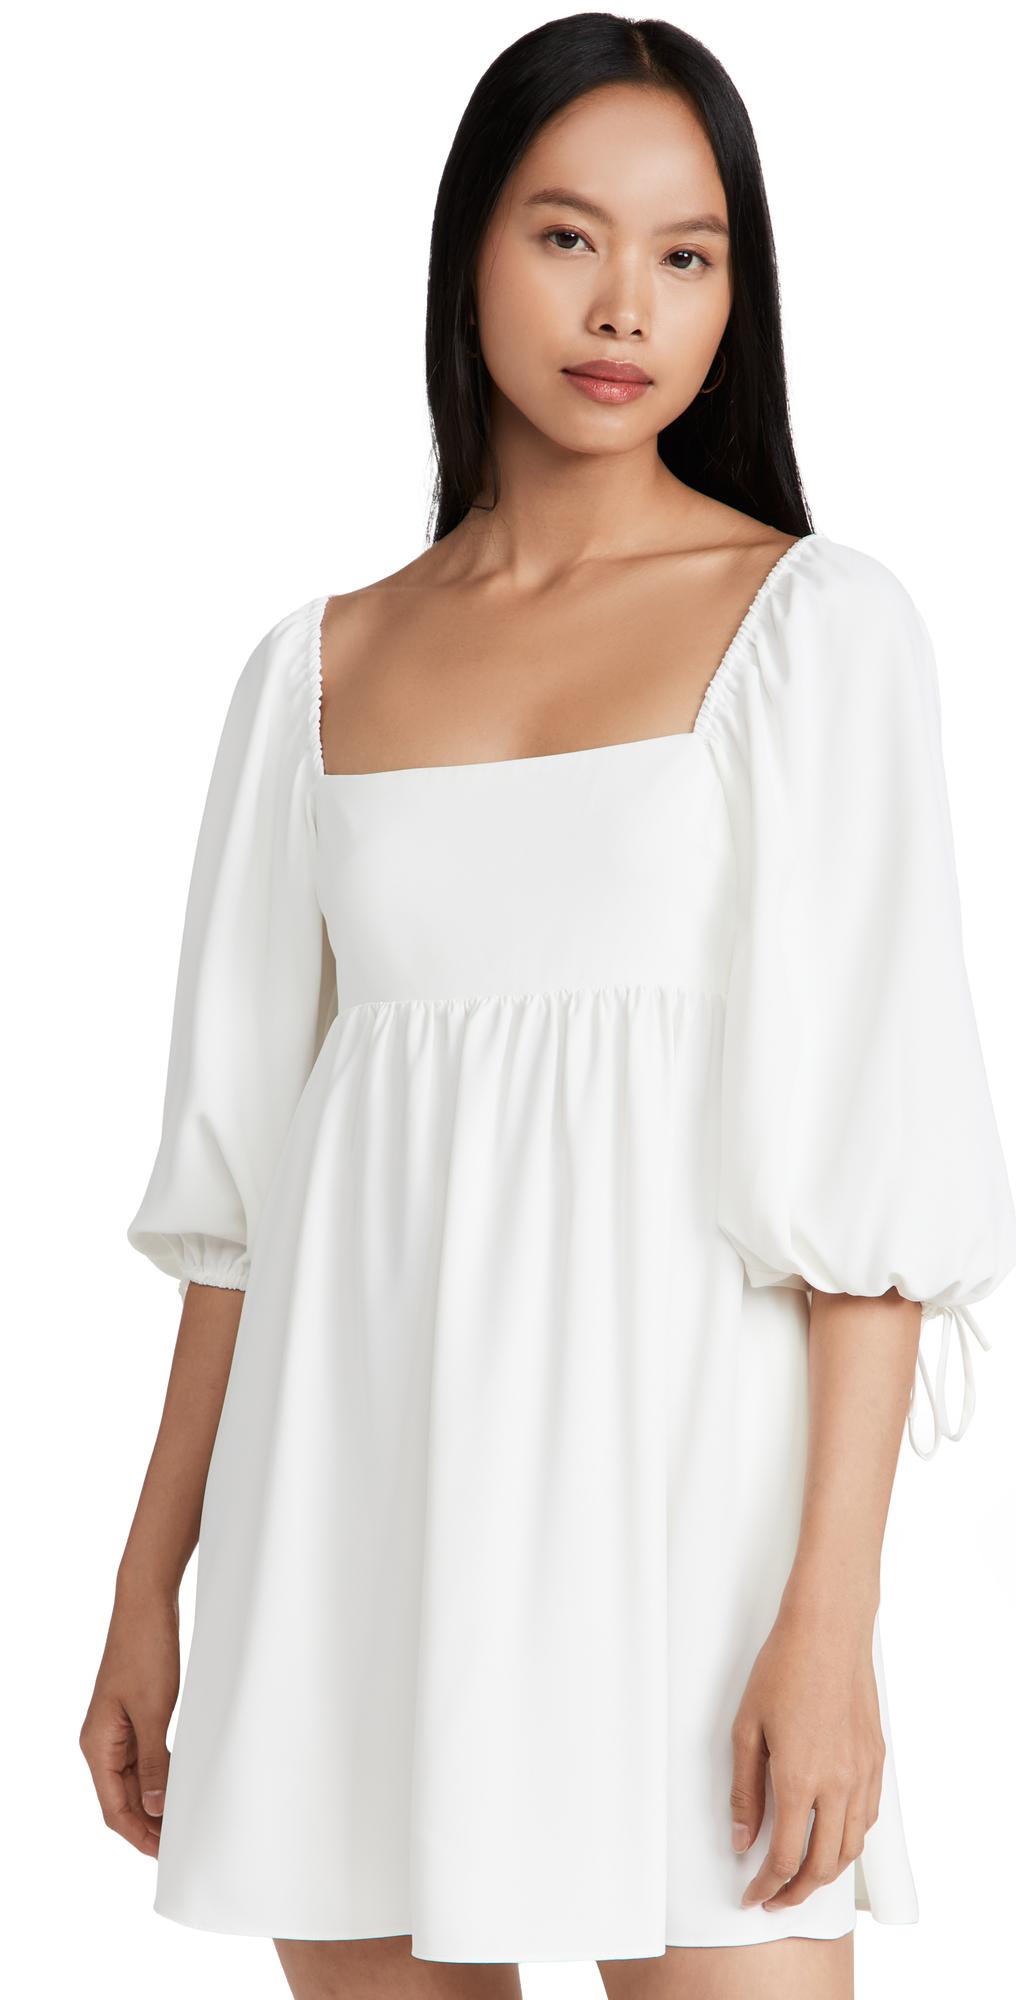 Darling Dress